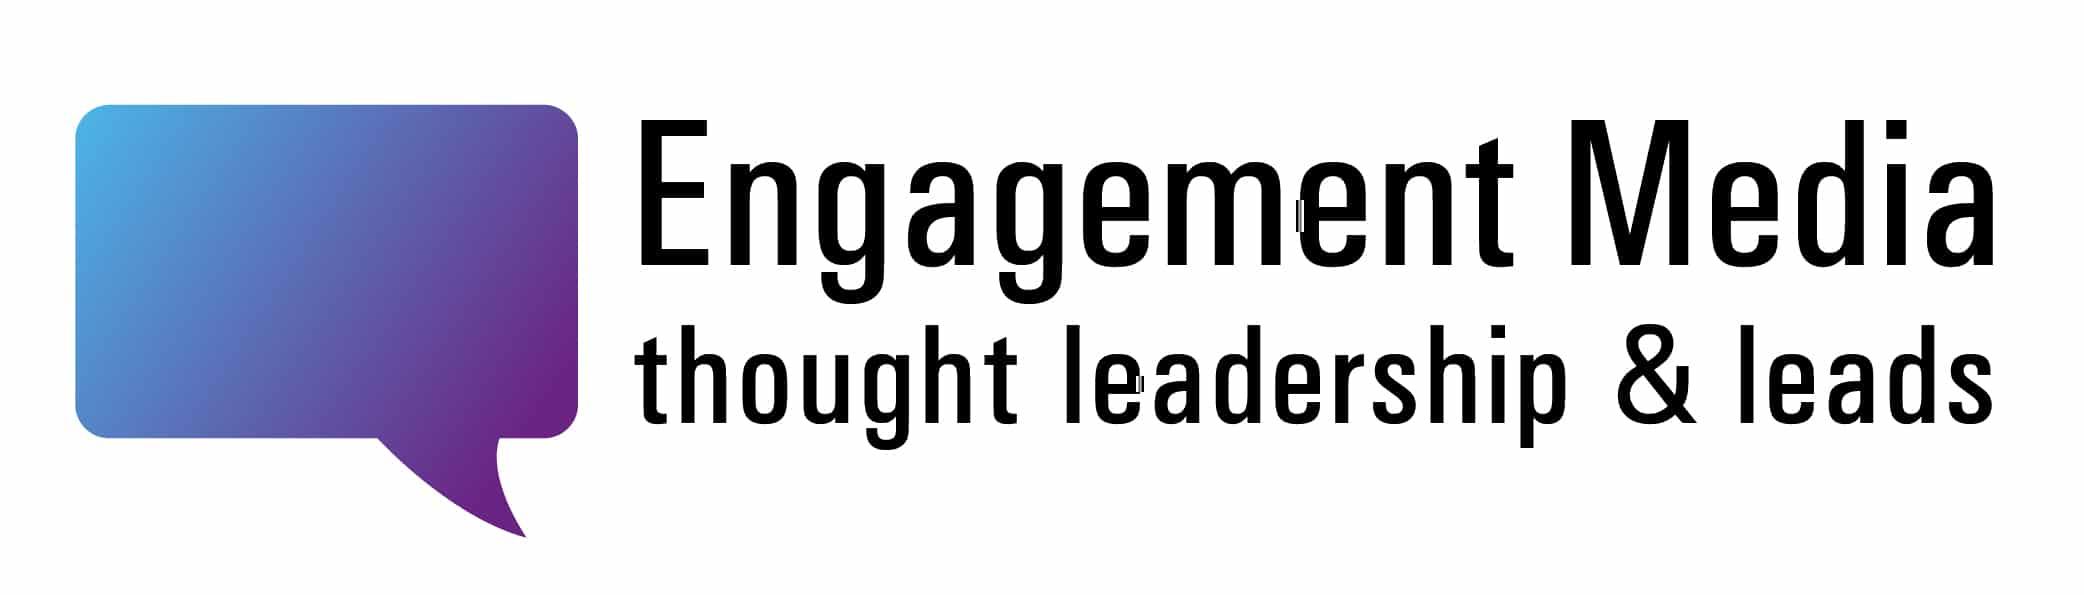 Engagement Media